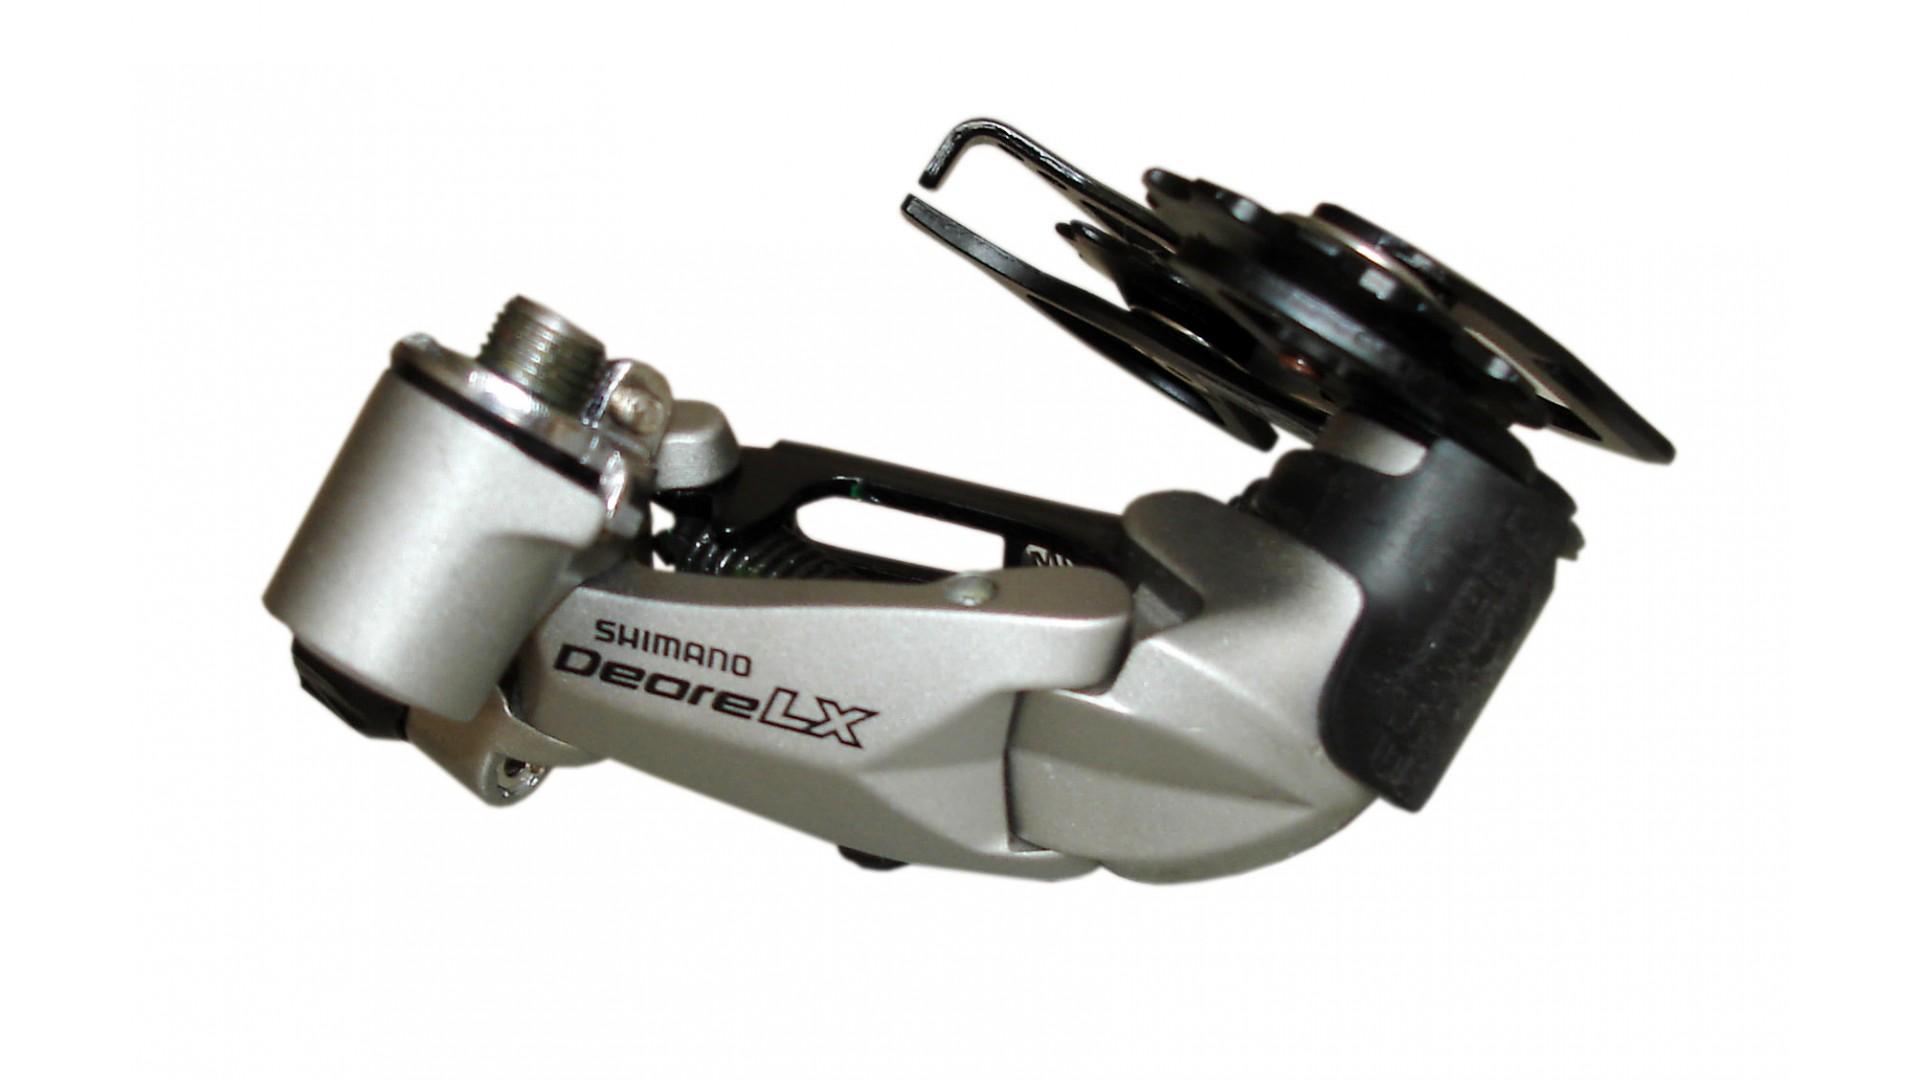 Переключатель задний Shimano RD-M580GS LX, 9-ск, Rapid Rise, среднее плечо